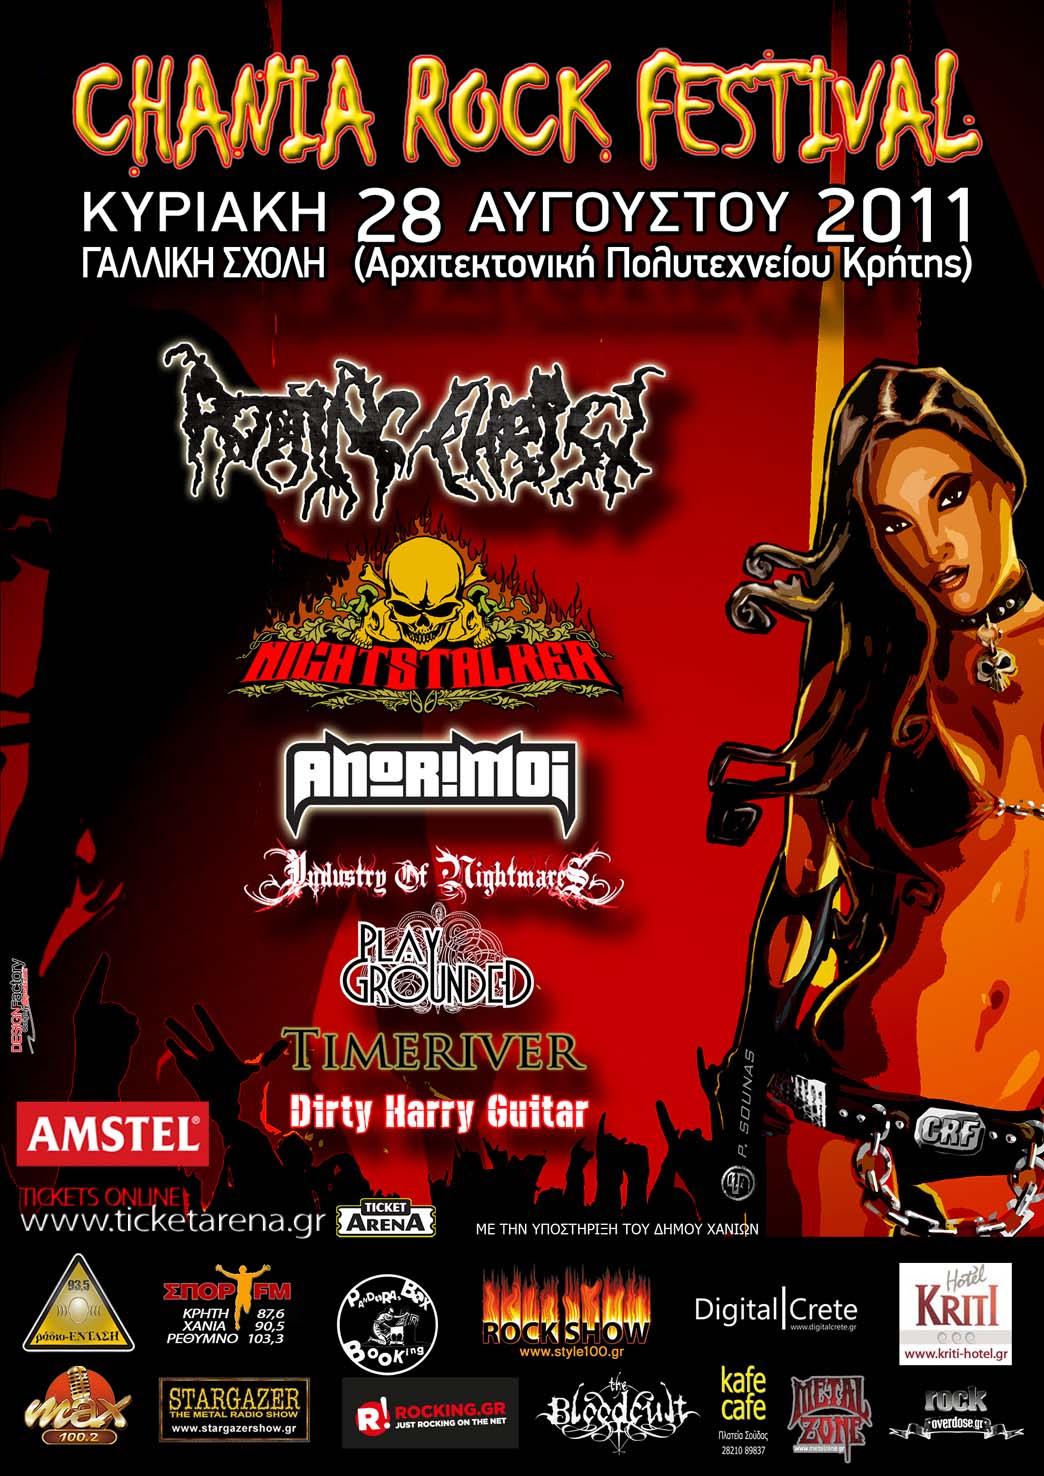 Chania Rock Festival 2011